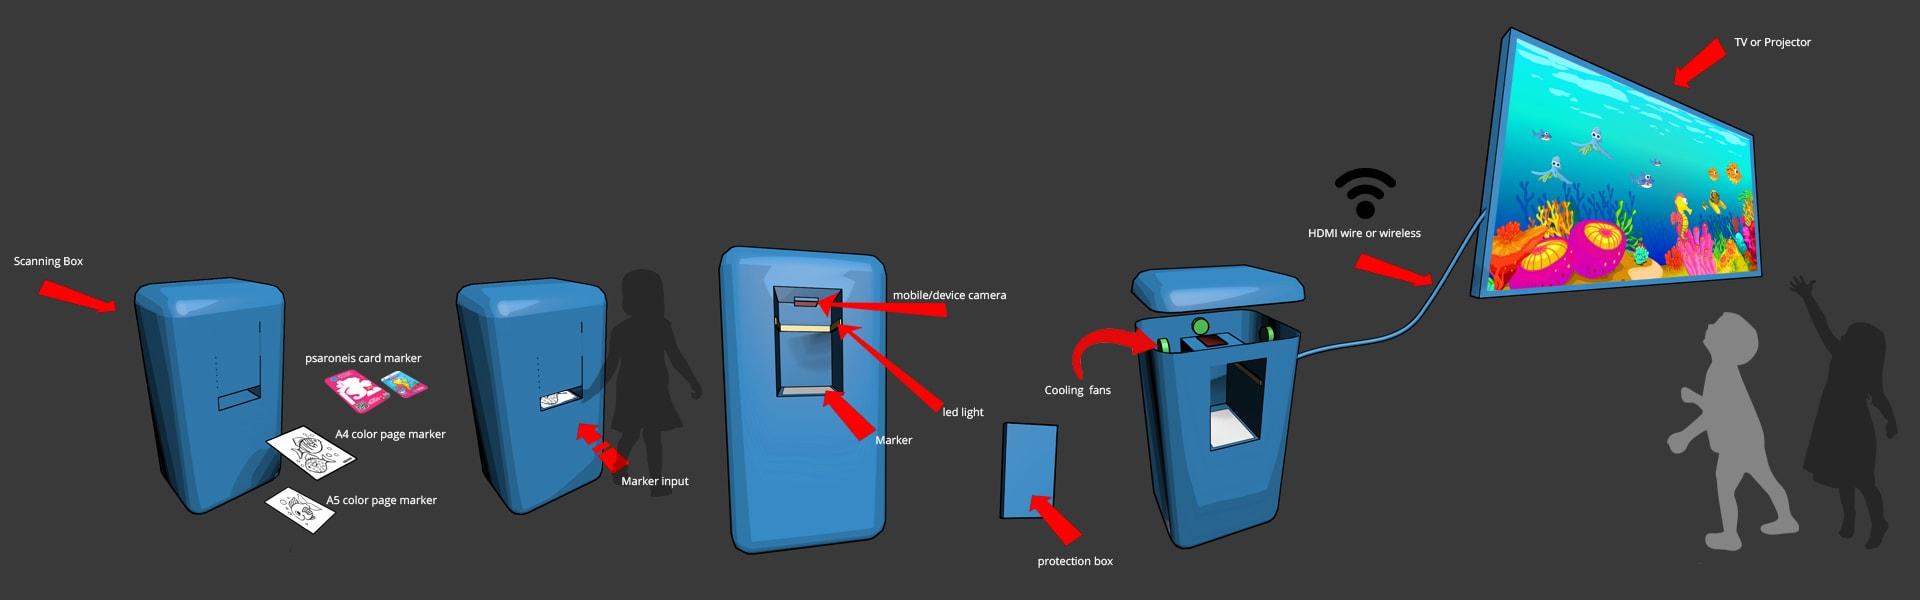 interactive installations explanation